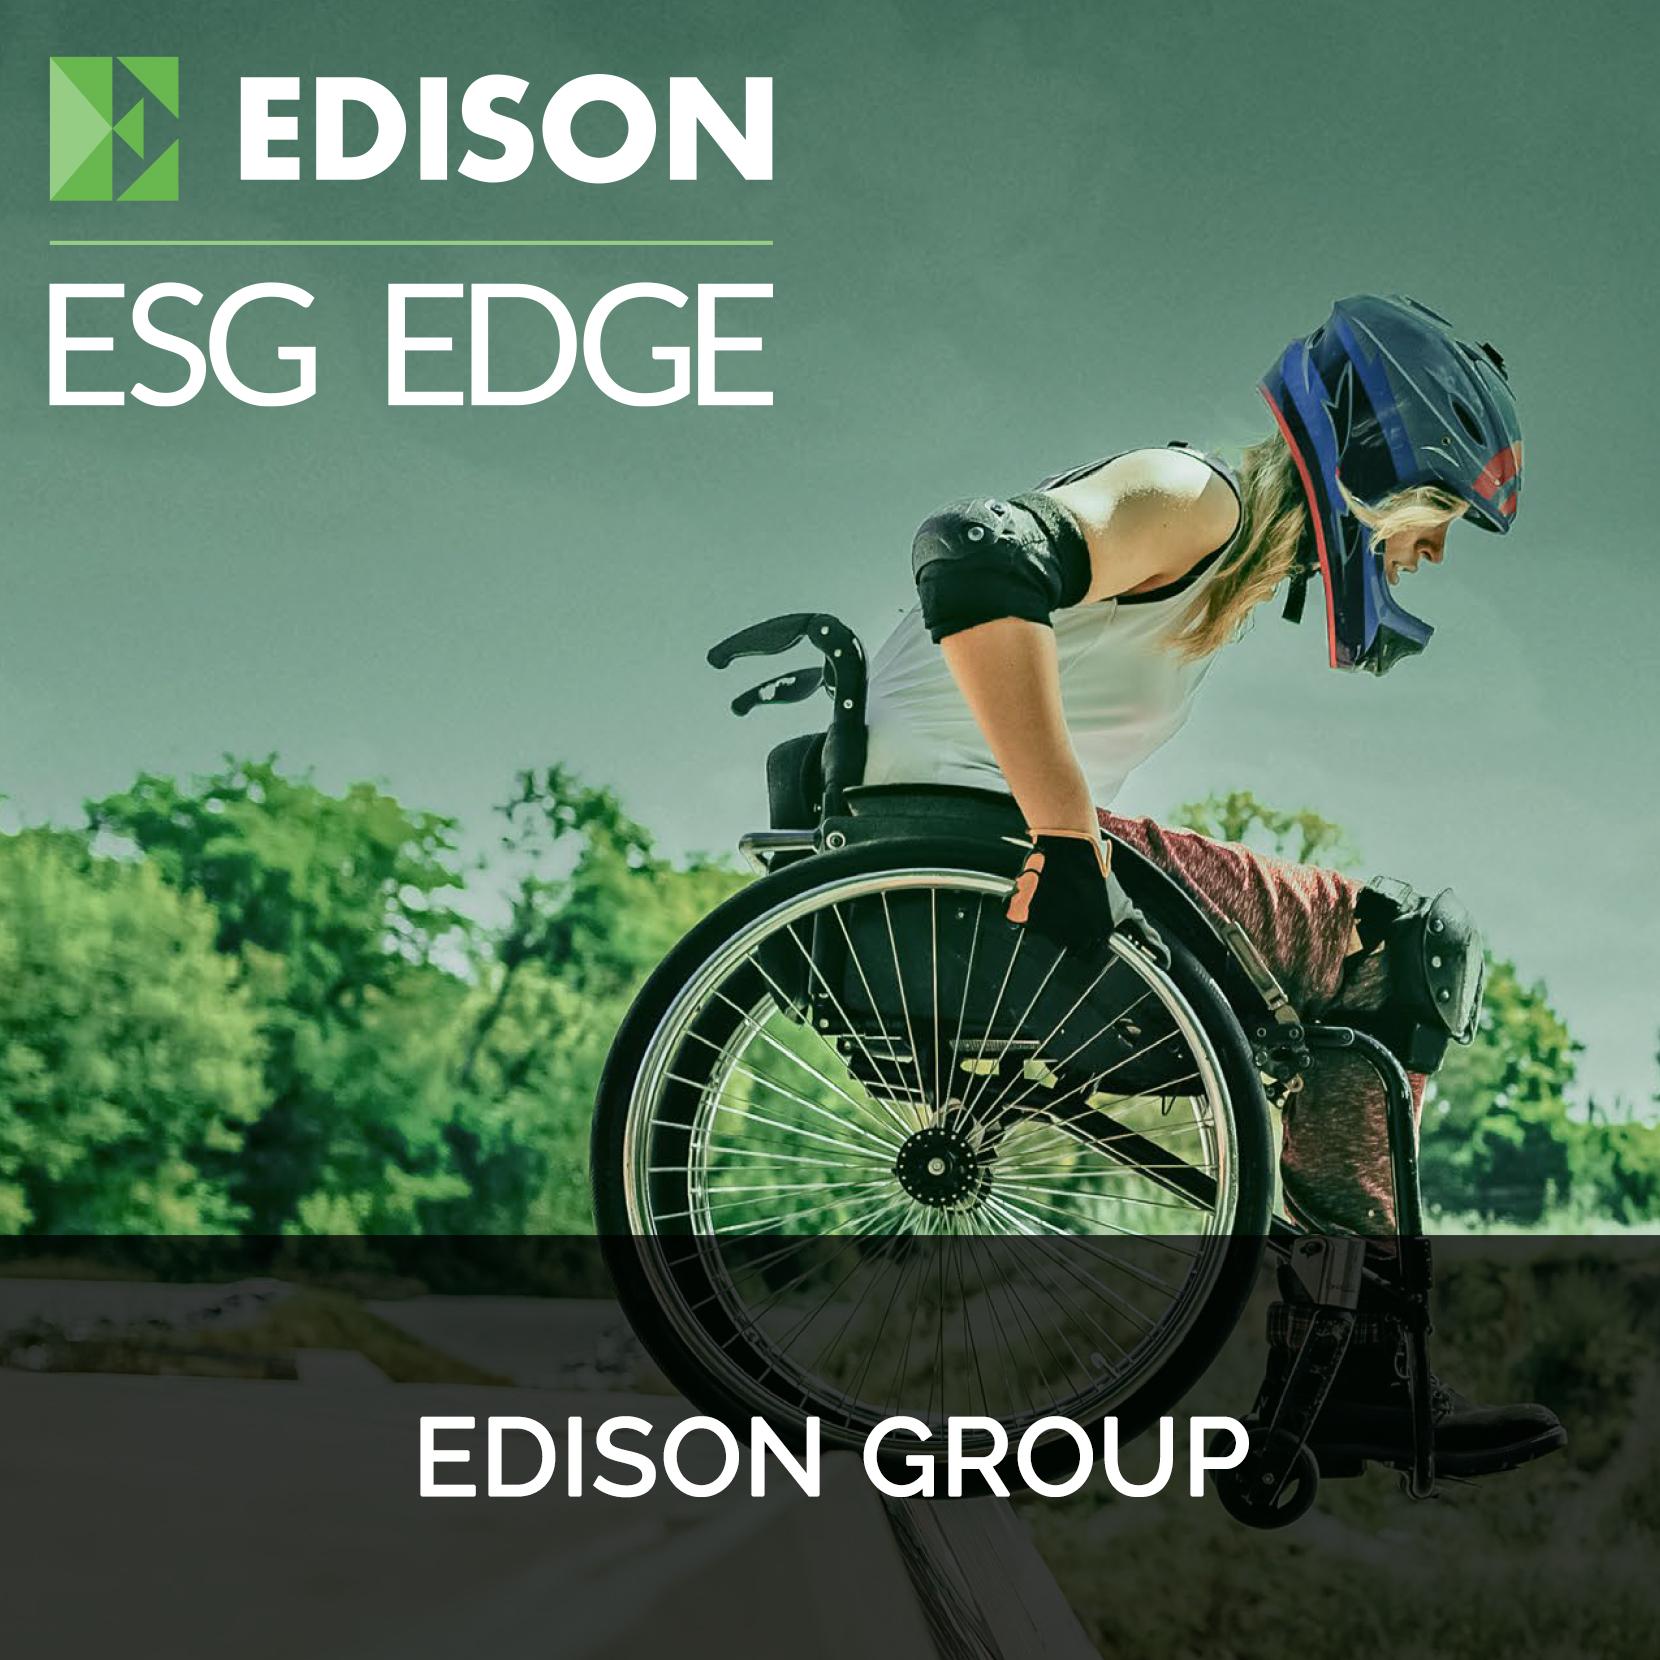 https://rusyndesign.co.uk/wp-content/uploads/2015/04/Work-square-Edison.jpg